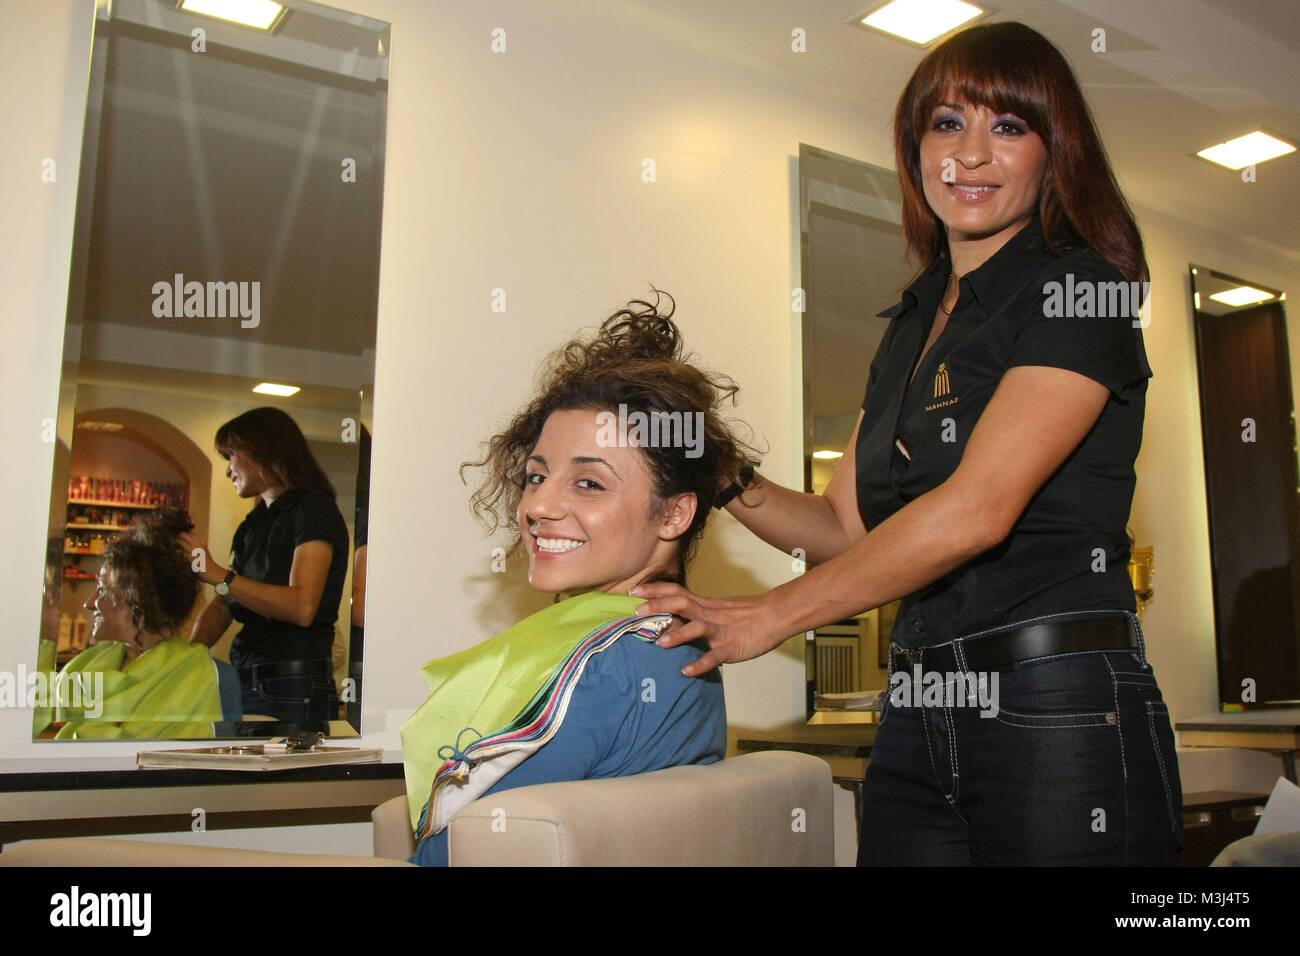 Styling Im Mahnaz Hair Beauty Galerie Moorweide Hamburg Stock